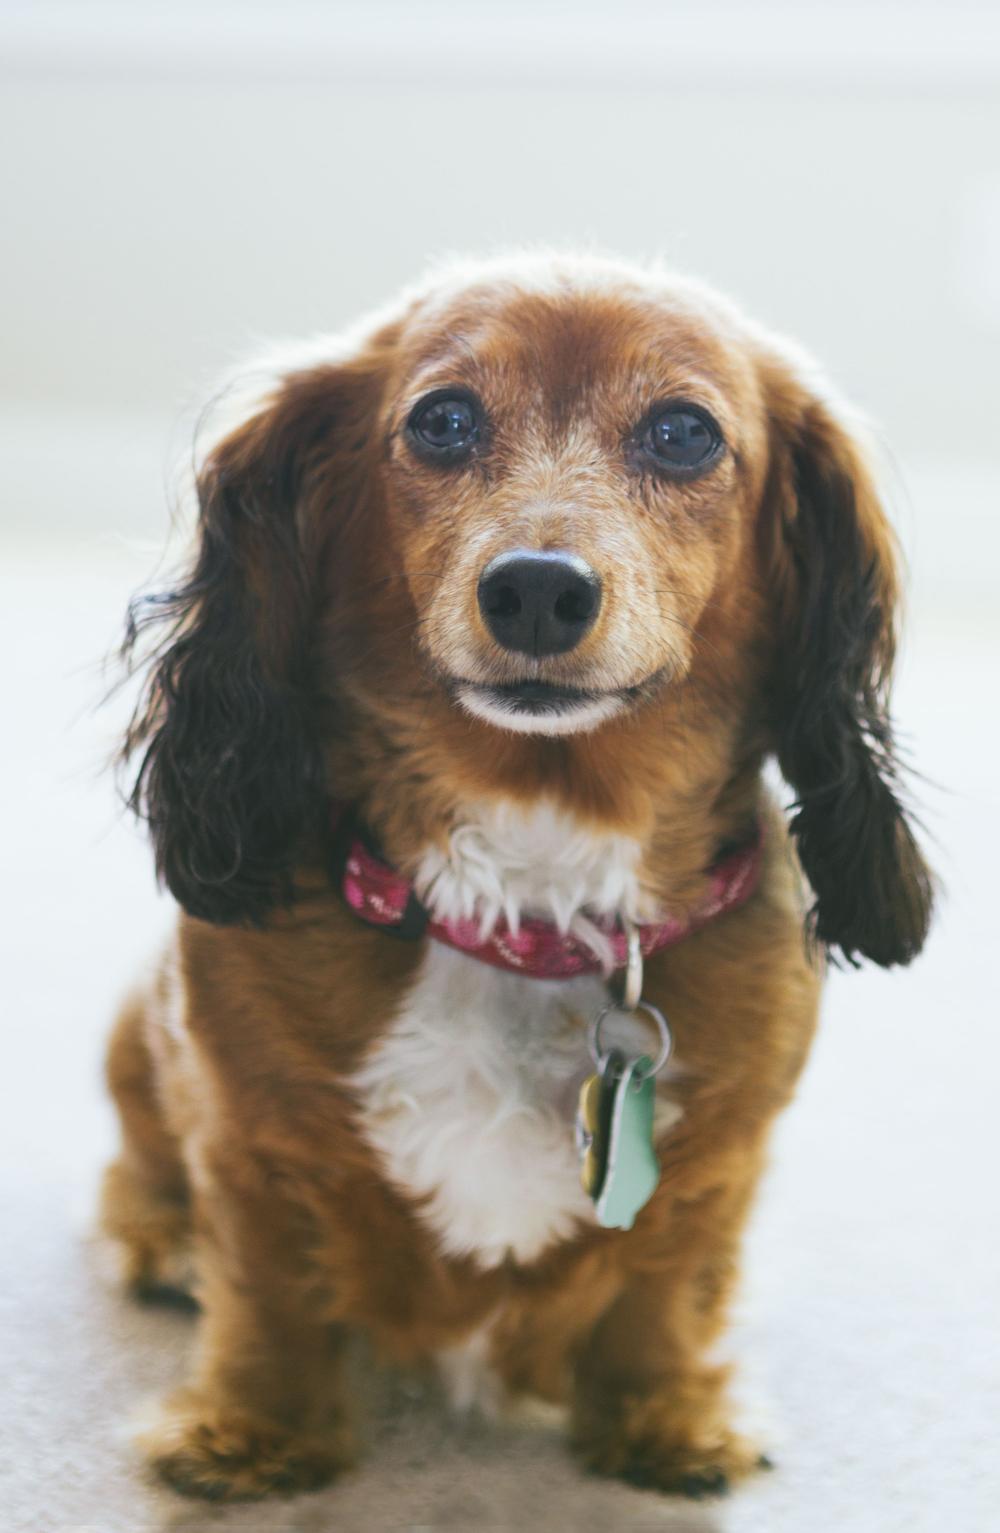 Dog Photo.jpg